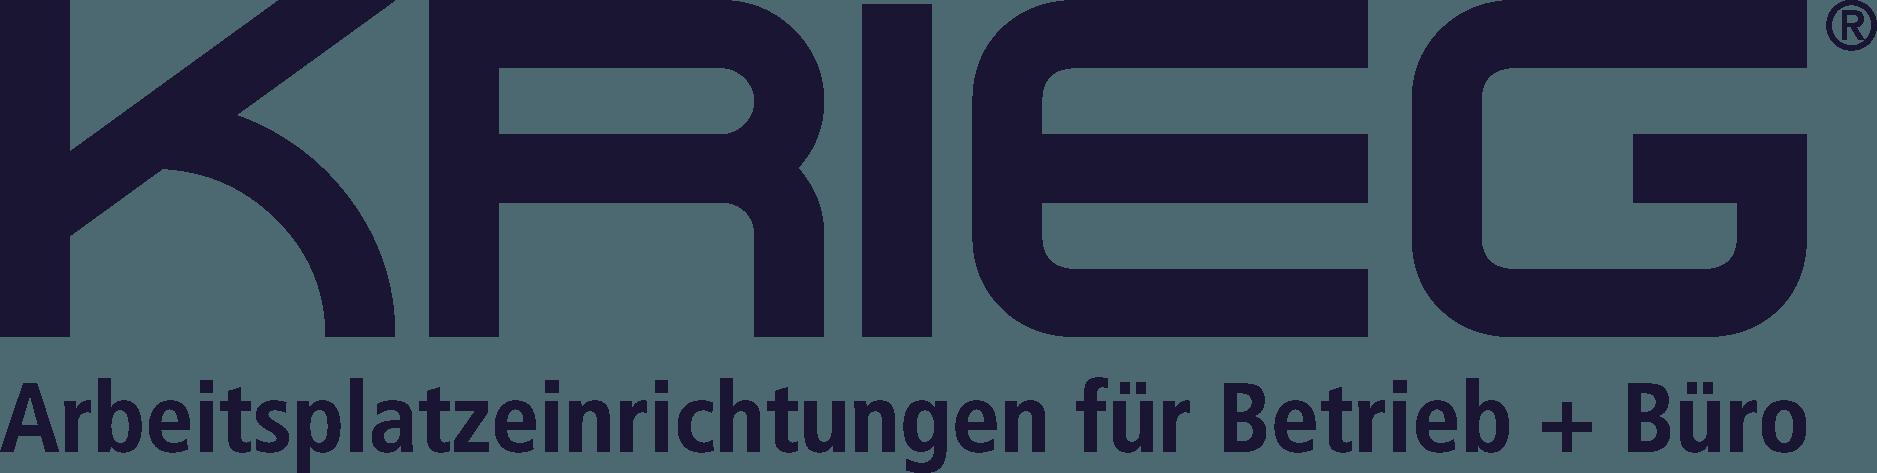 KRIEG Industriegeräte GmbH & Co. KG